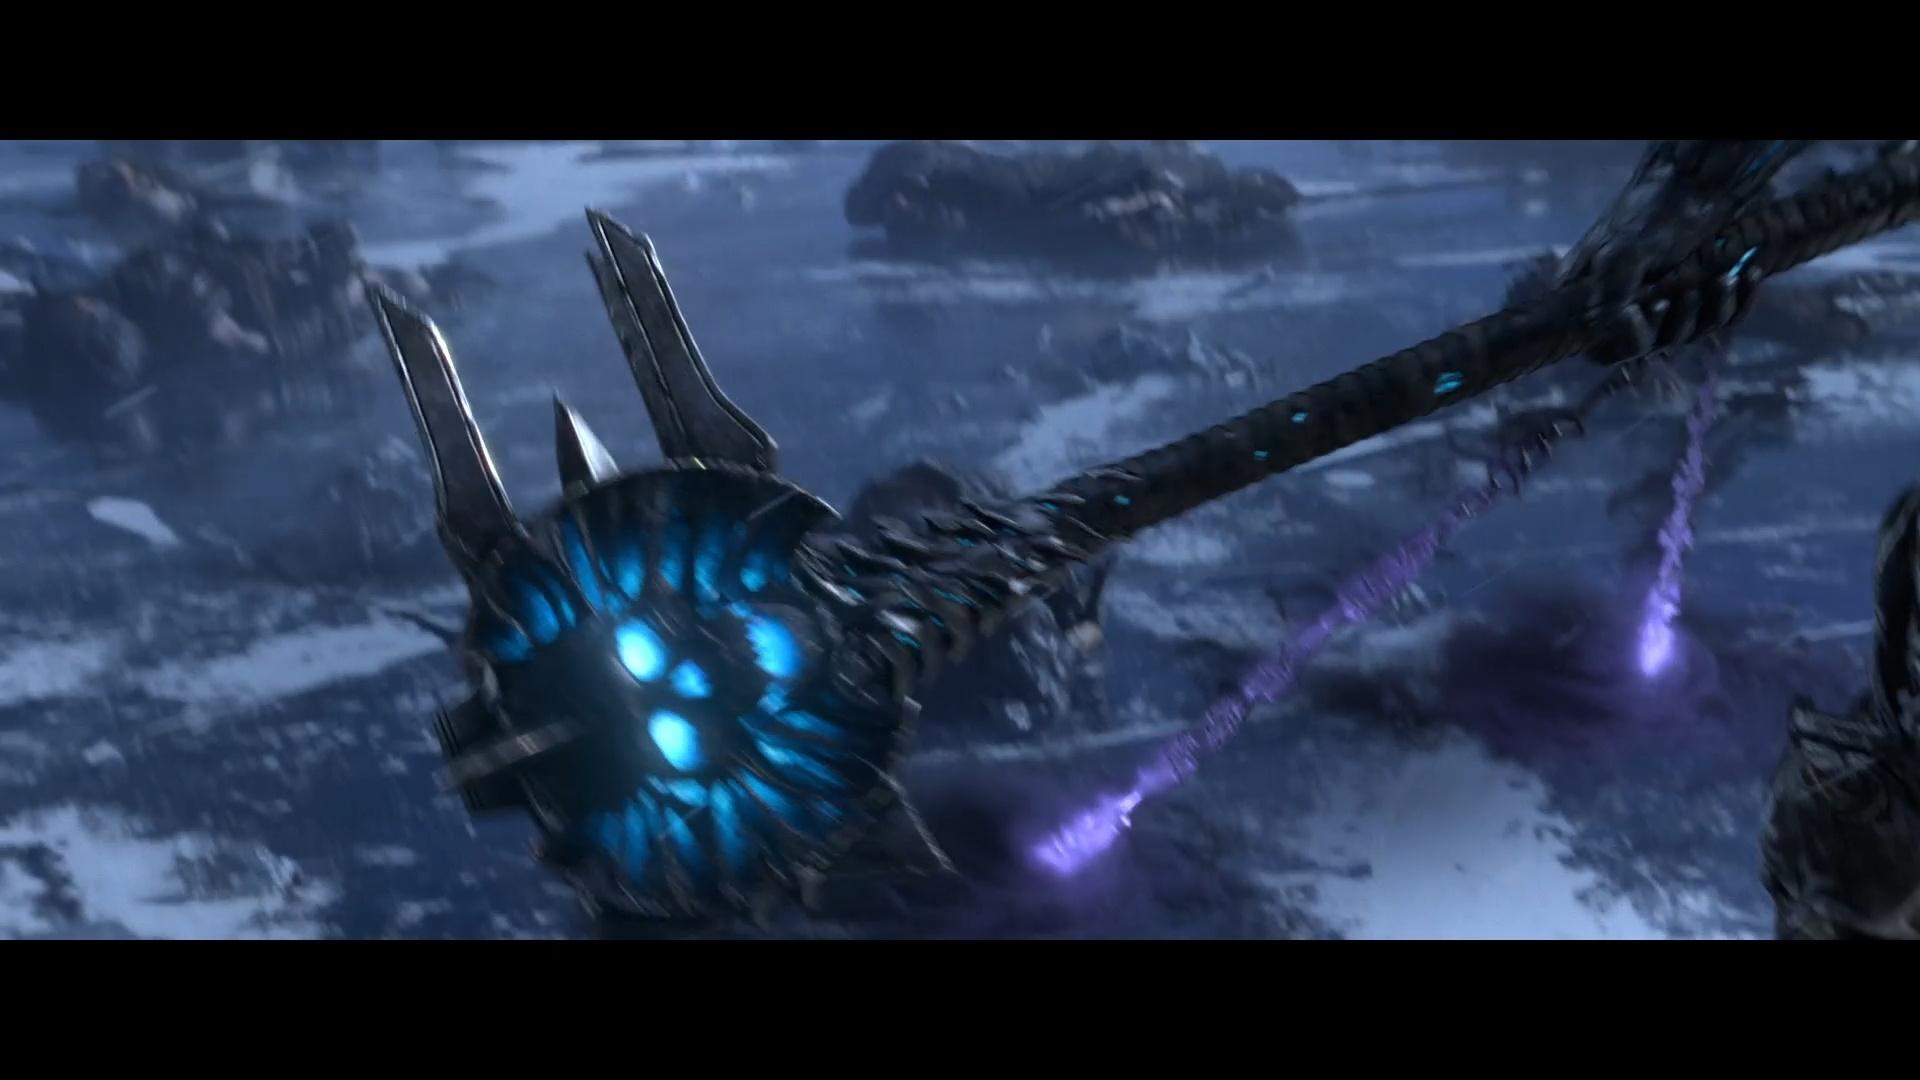 New World Of Warcraft Expansion 2020.New World Of Warcraft Expansion Revealed Shadowlands